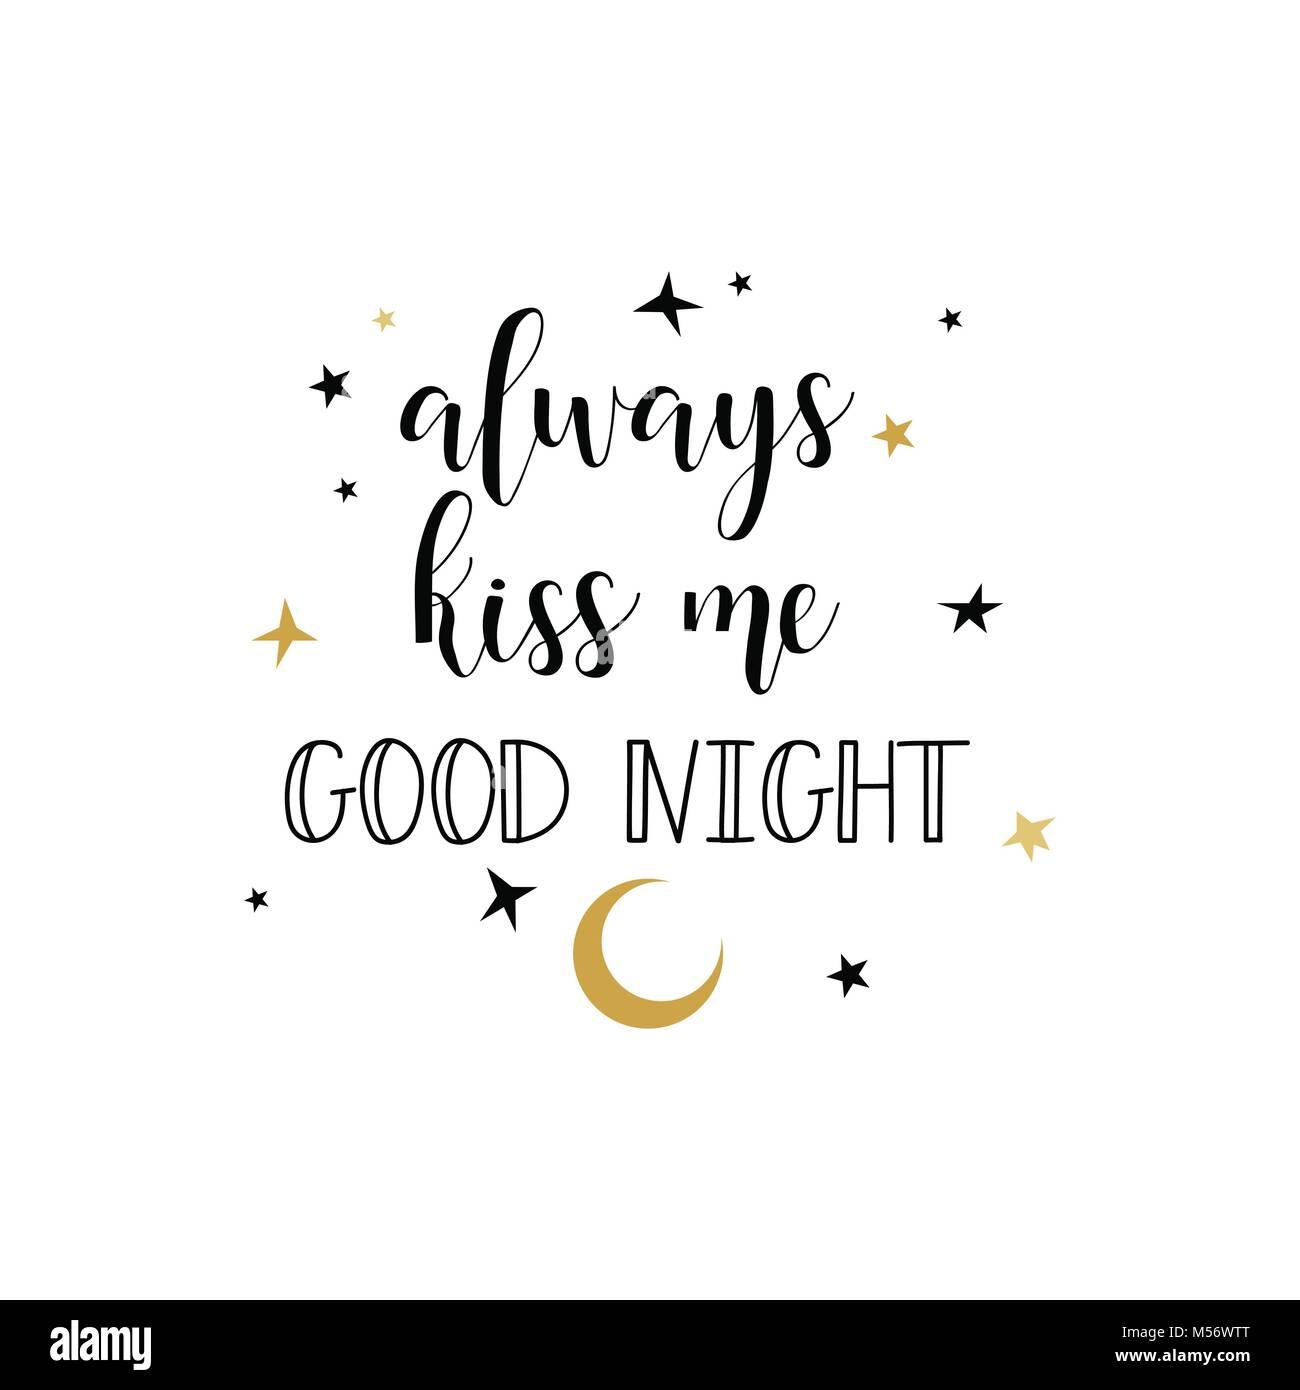 Siempre Me Beso De Buenas Noches Cepillo Moderno Caligrafia